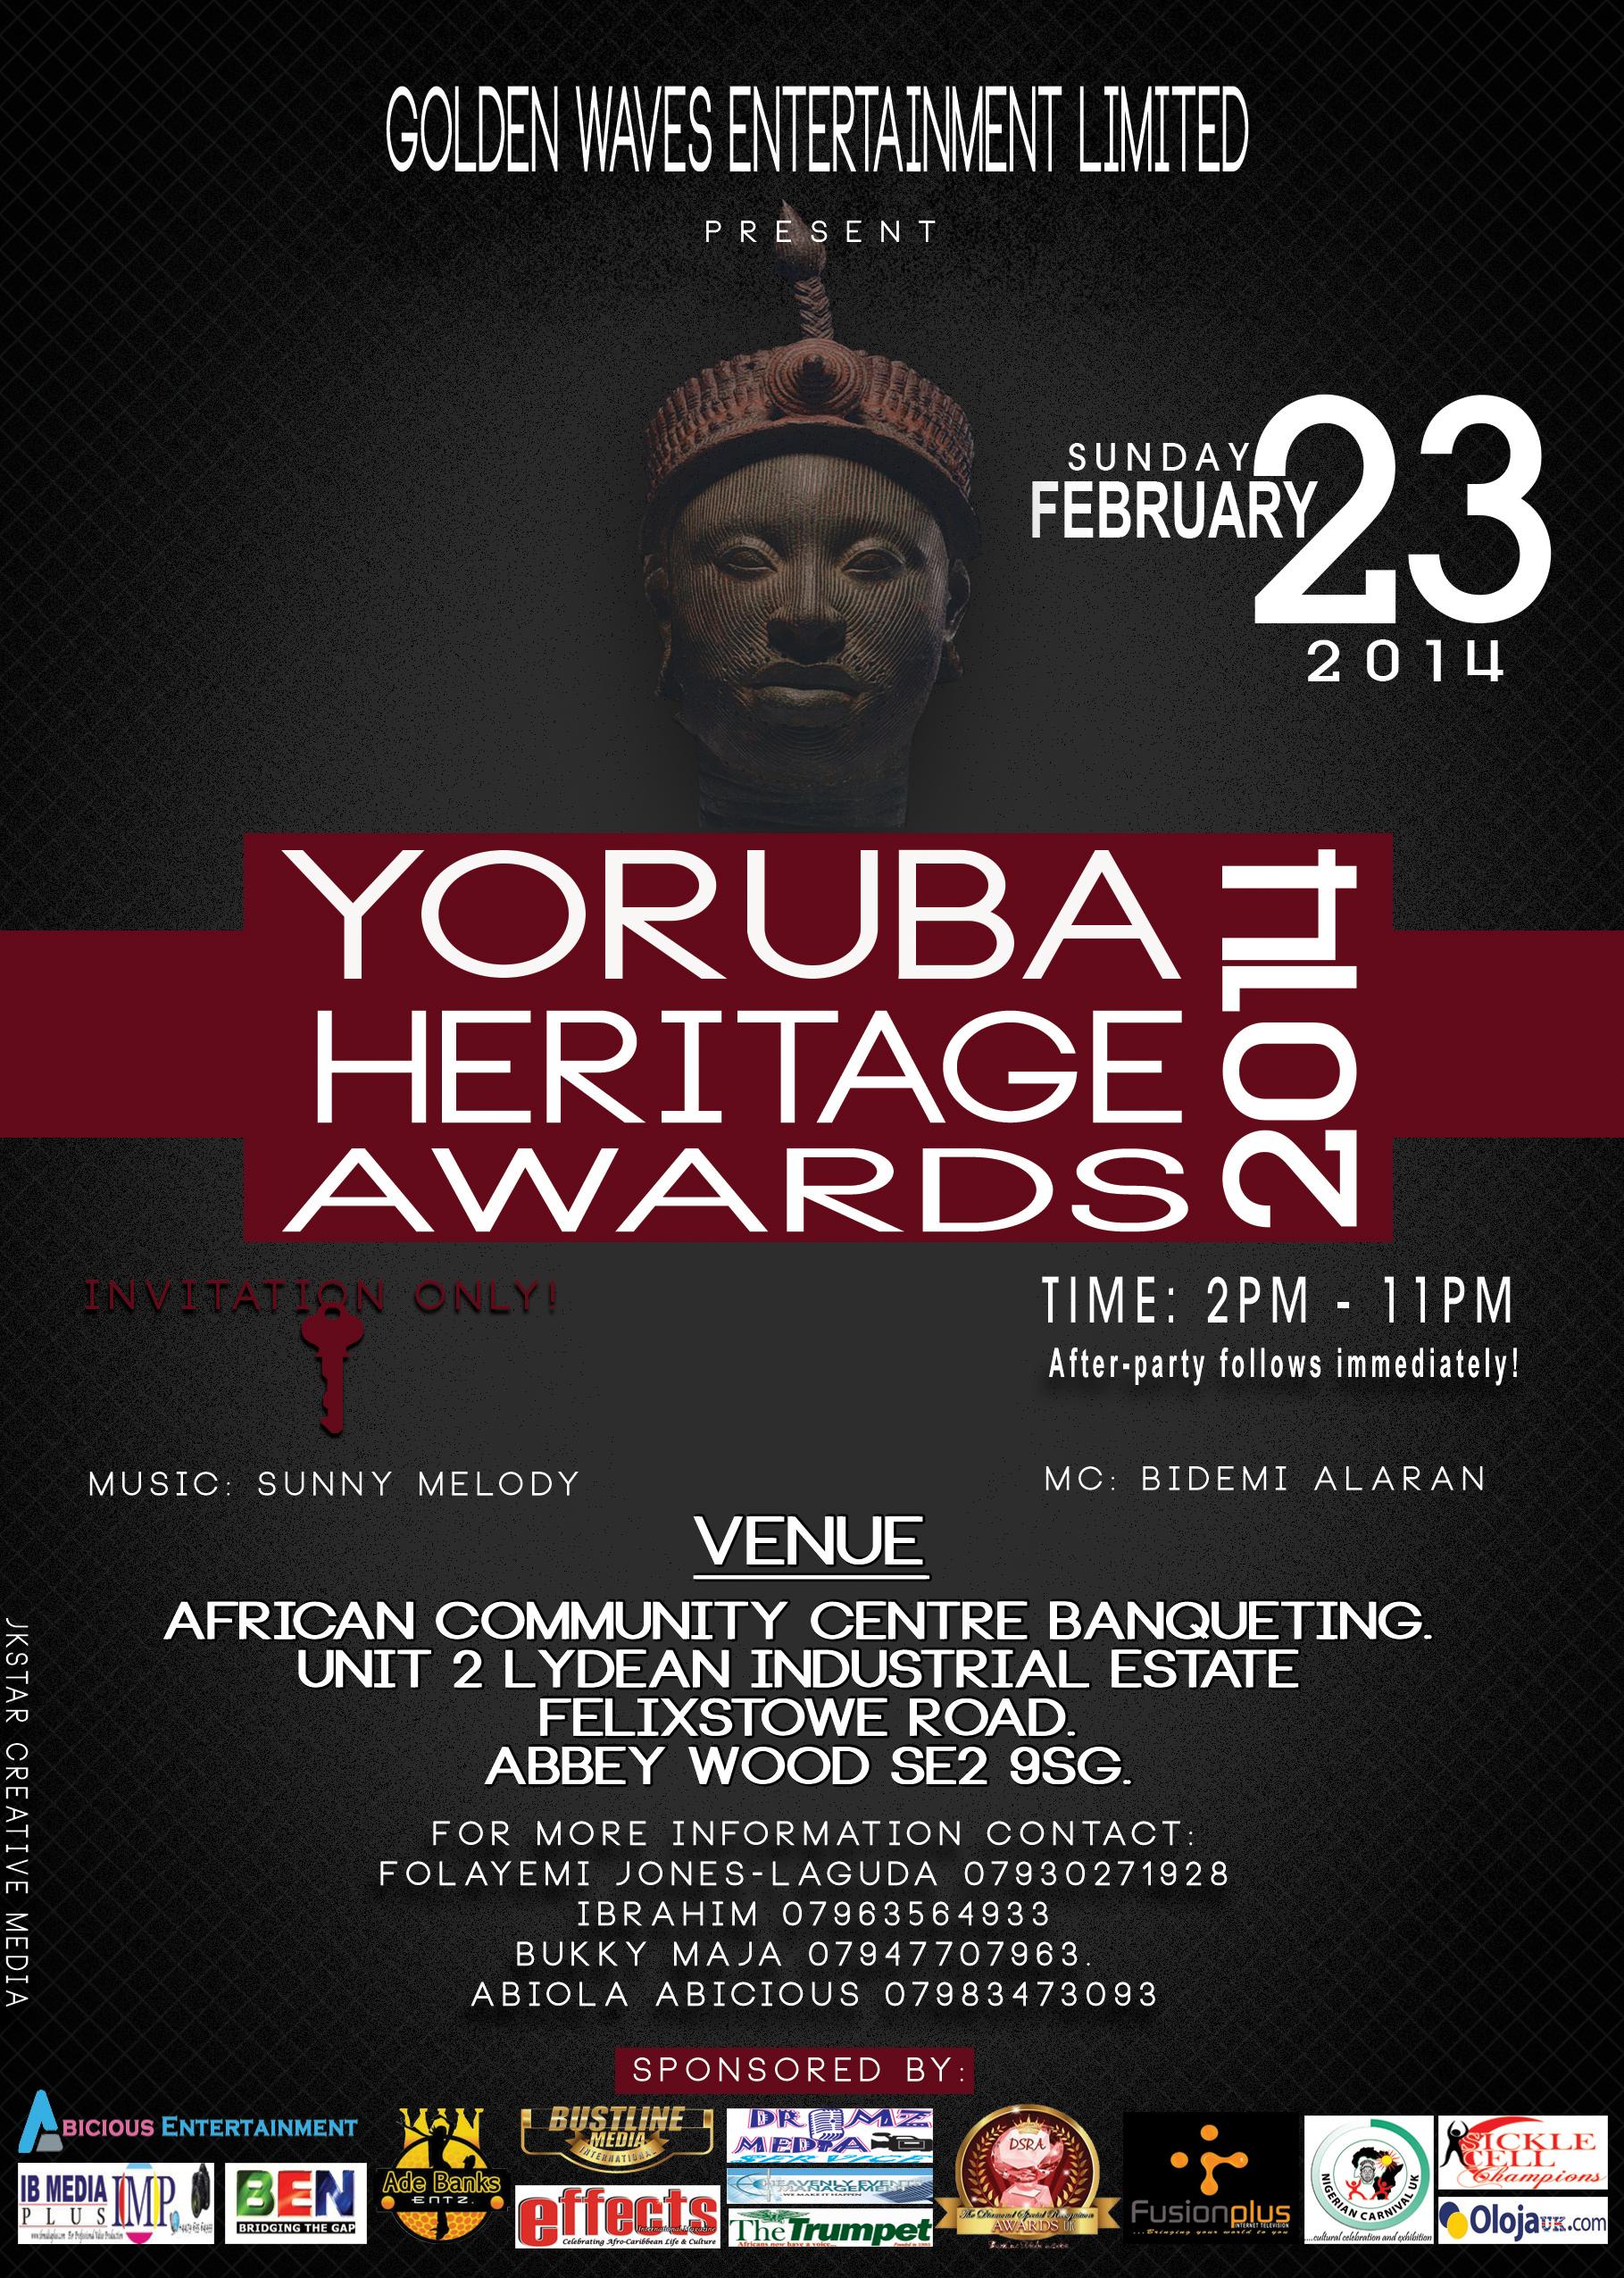 YORUBA HERITAGE AWARD 2014